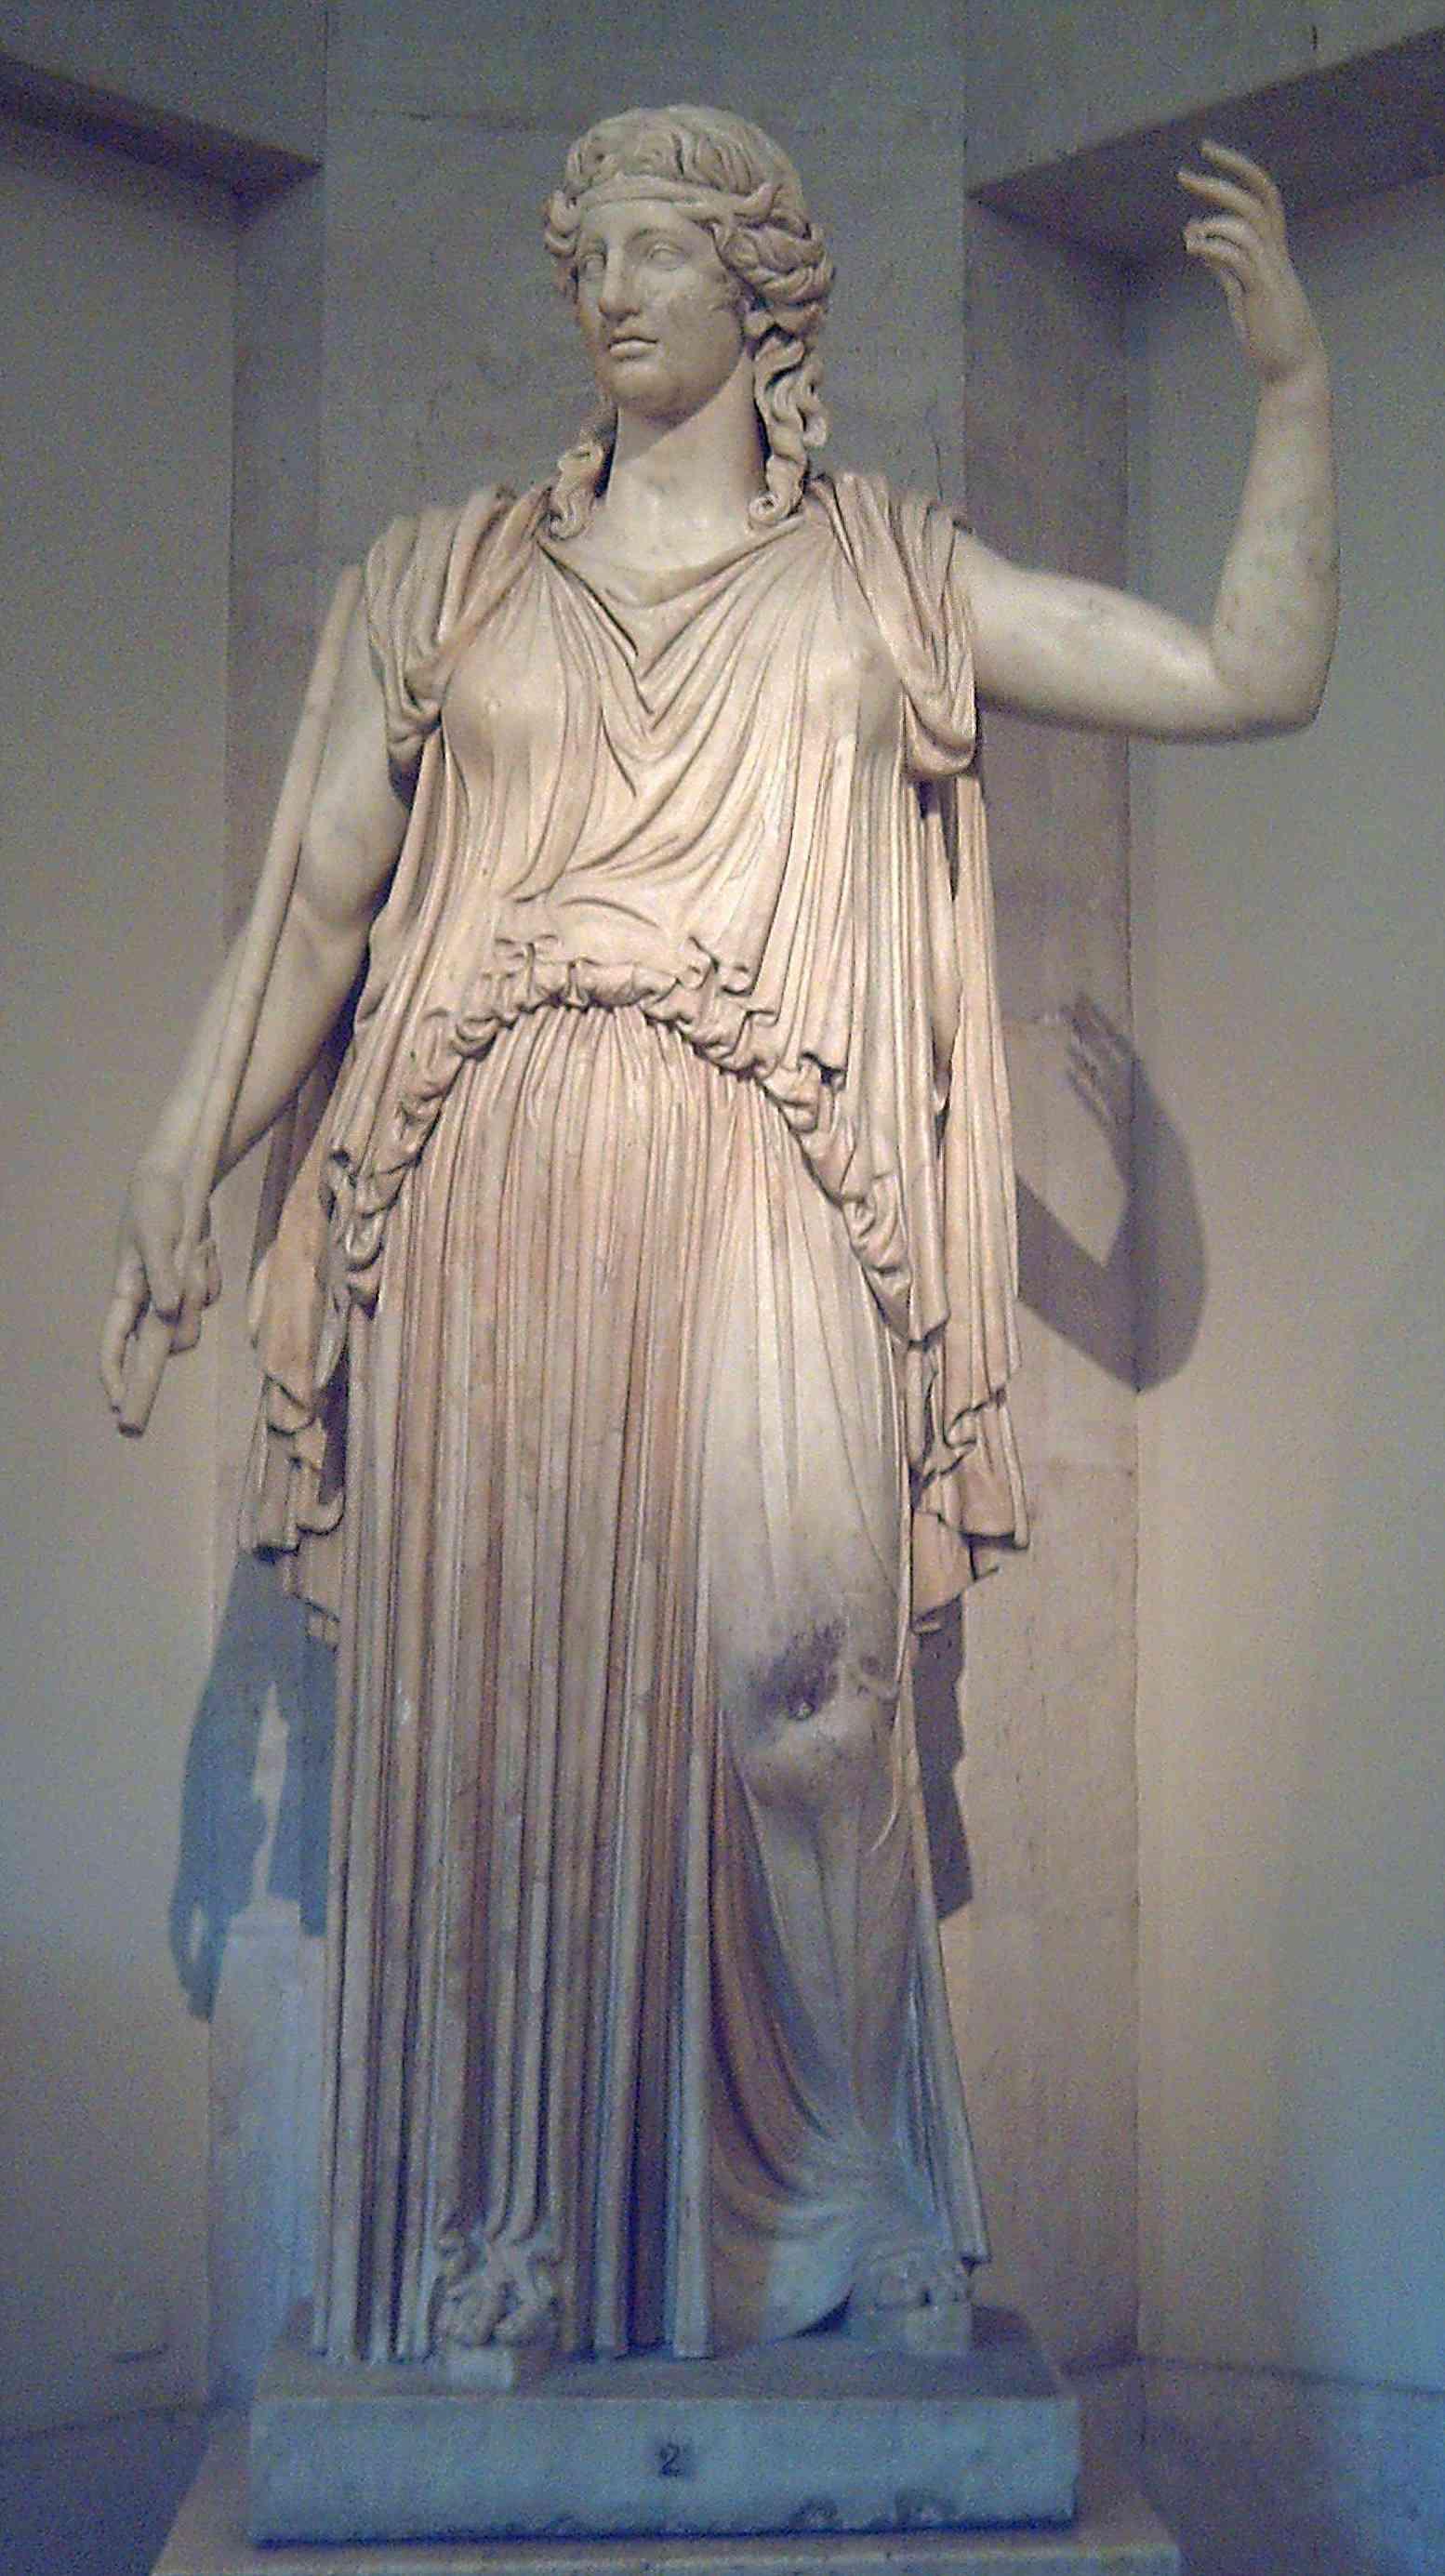 Demeter Statue at the Prado Museum in Madrid